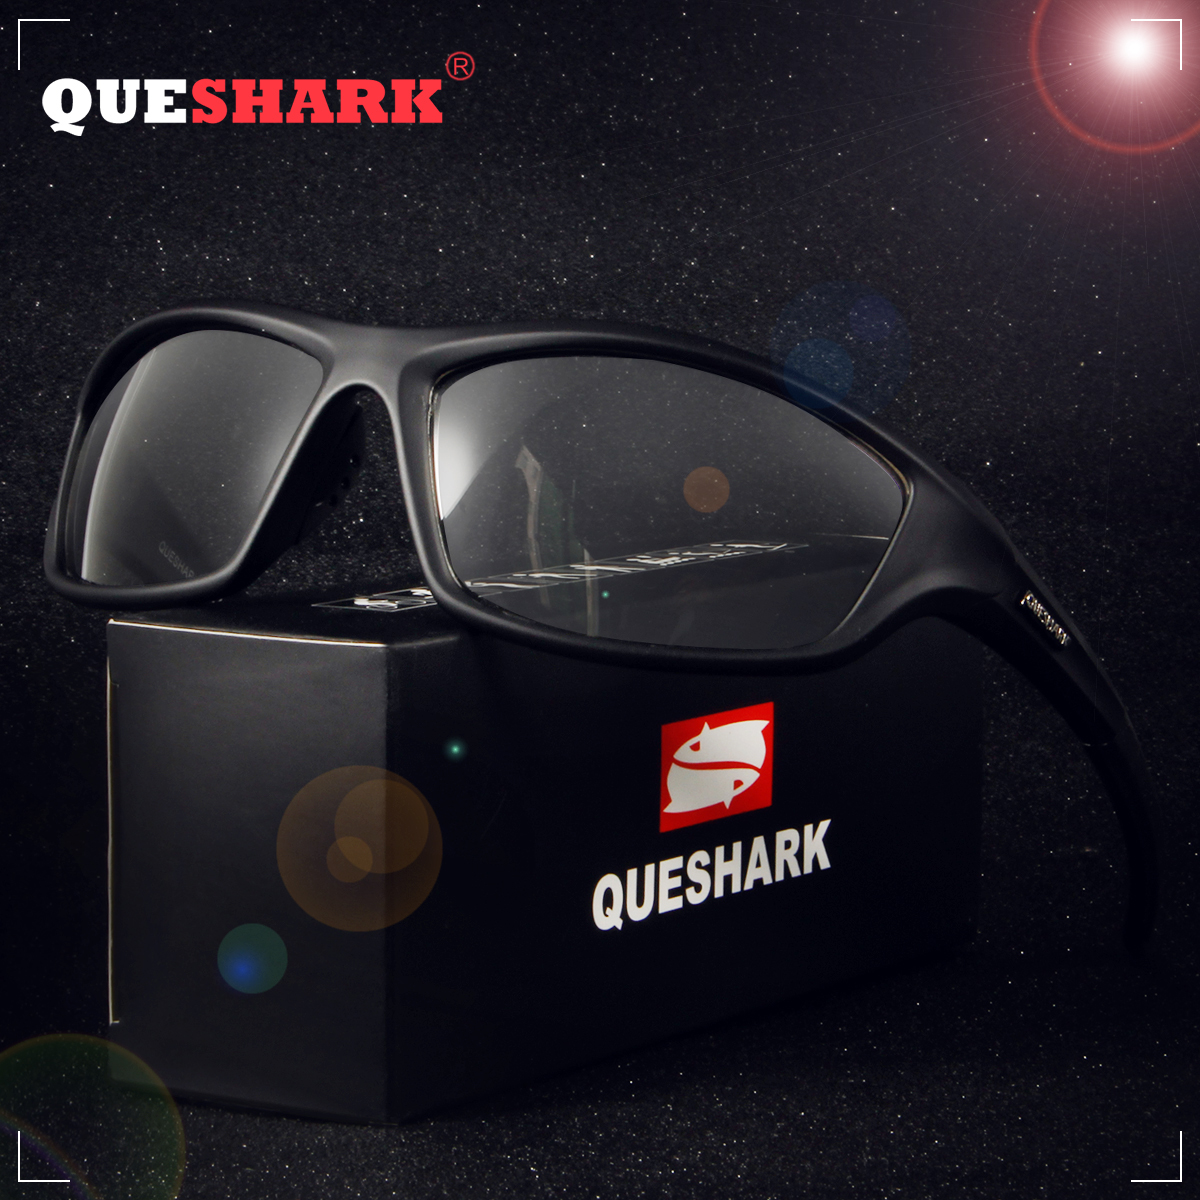 f4ccee9803 Gafas de sol fotocromáticas deportivas QUESHARK para hombre gafas de sol de  decoloración camaleón para hombre gafas antideslumbrantes para conducir  pesca